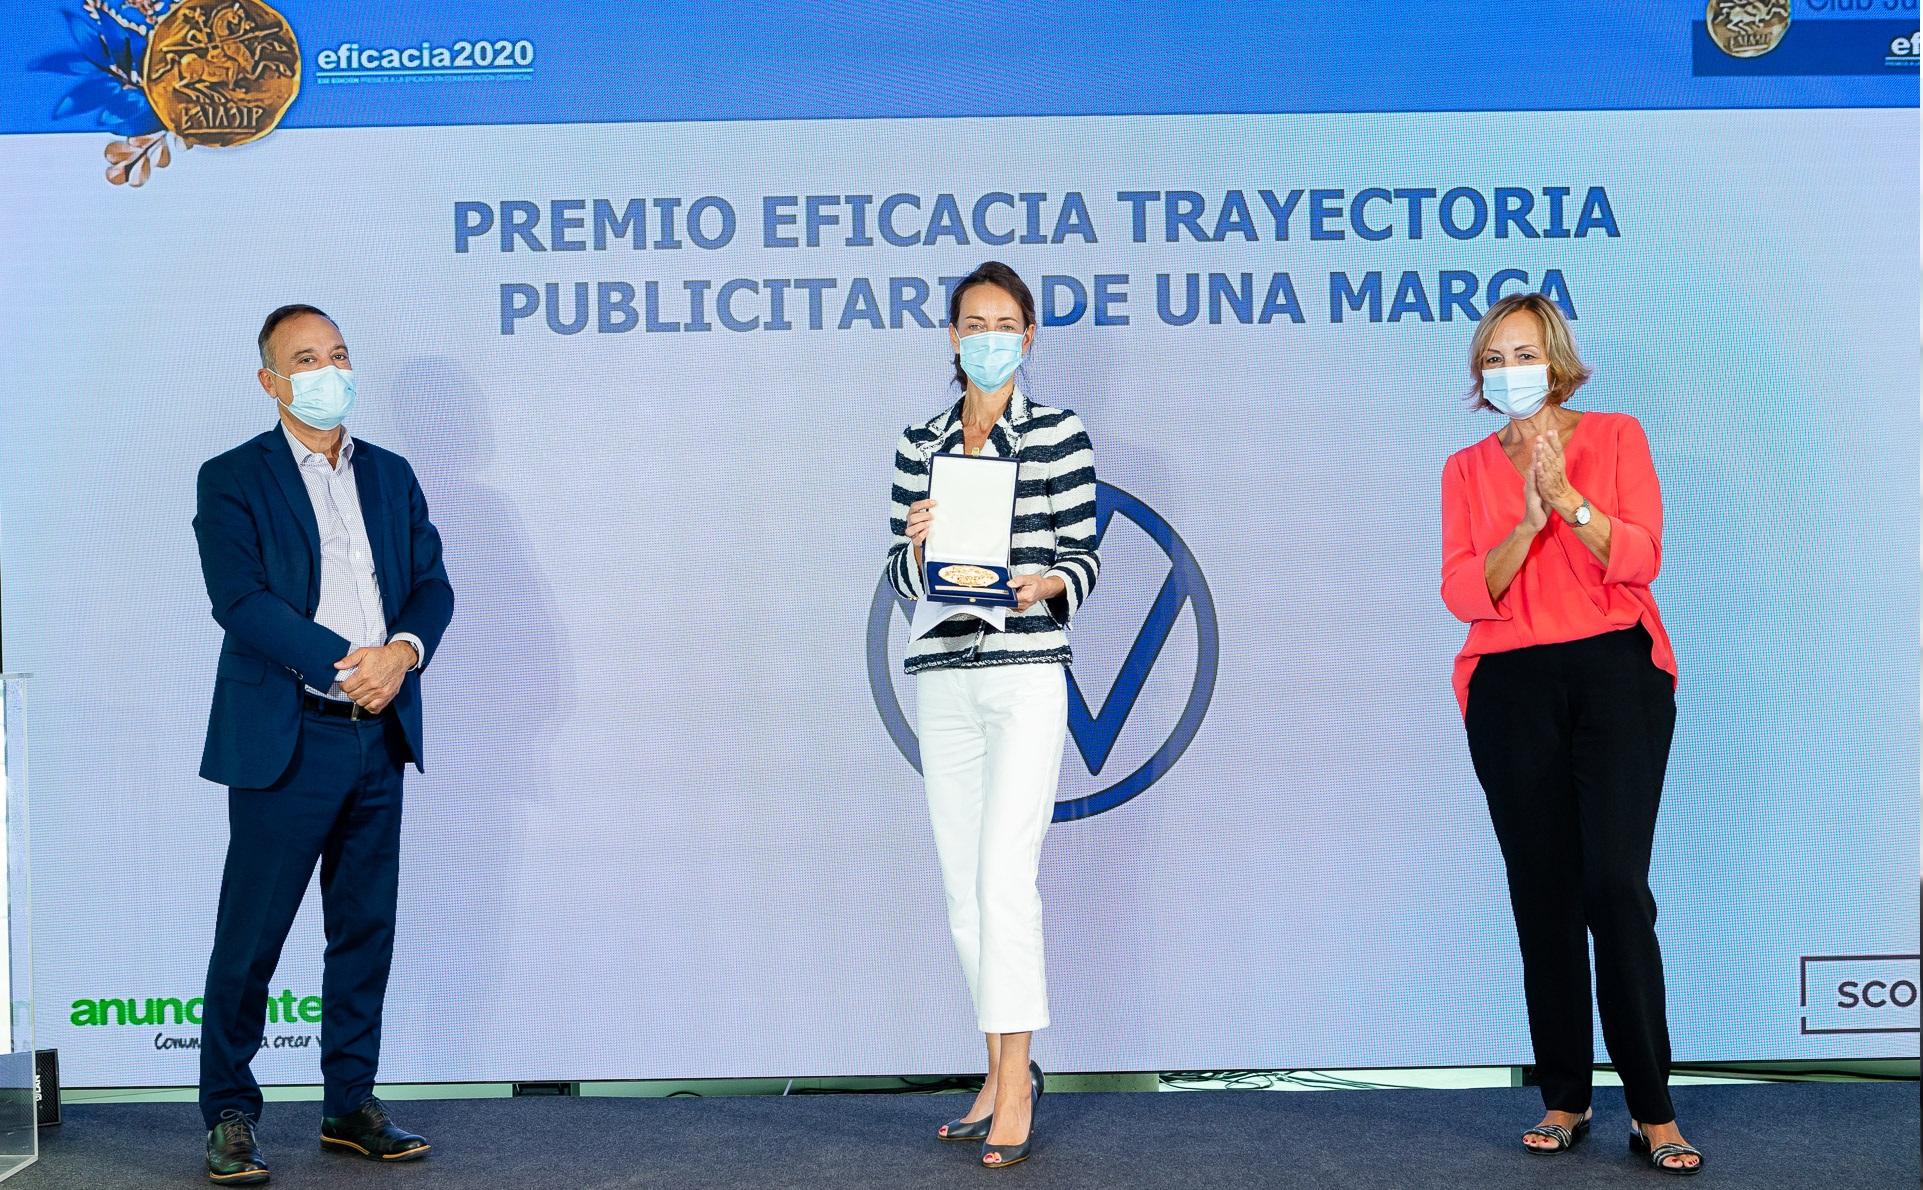 https://www.programapublicidad.com/wp-content/uploads/2020/09/César-Vacchiano-SCOPEN-Ana-Rivas-Comunicación-Corporativa-Volkswagen-Lidia-Sanz-aea-programapublicidad.jpg